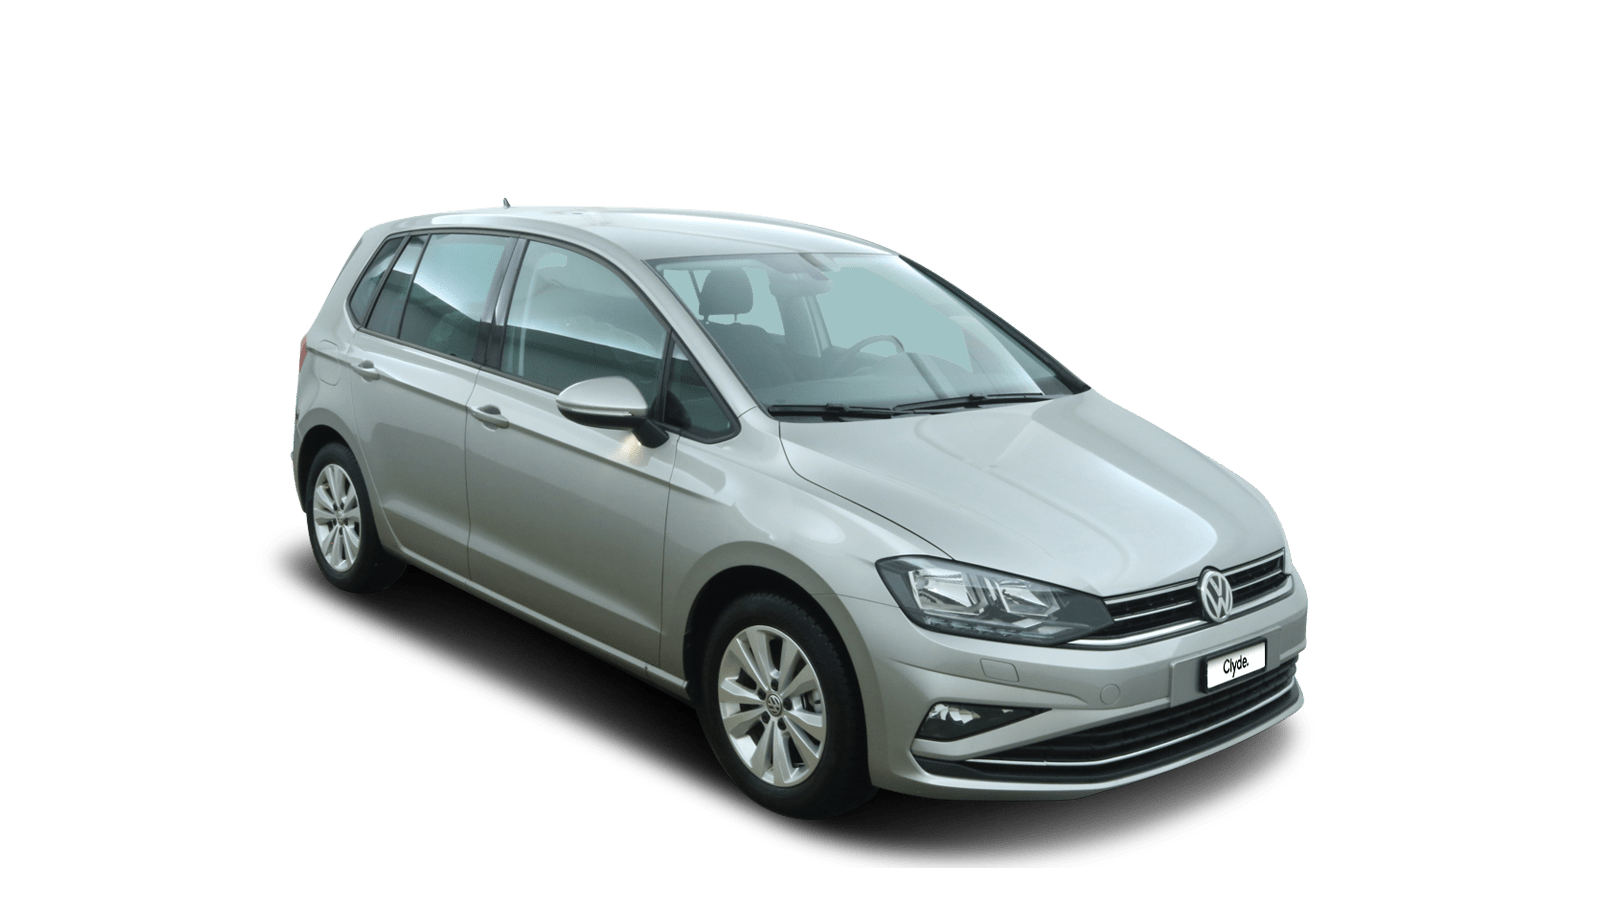 VW Golf Sportsvan Silver front - Clyde car subscription